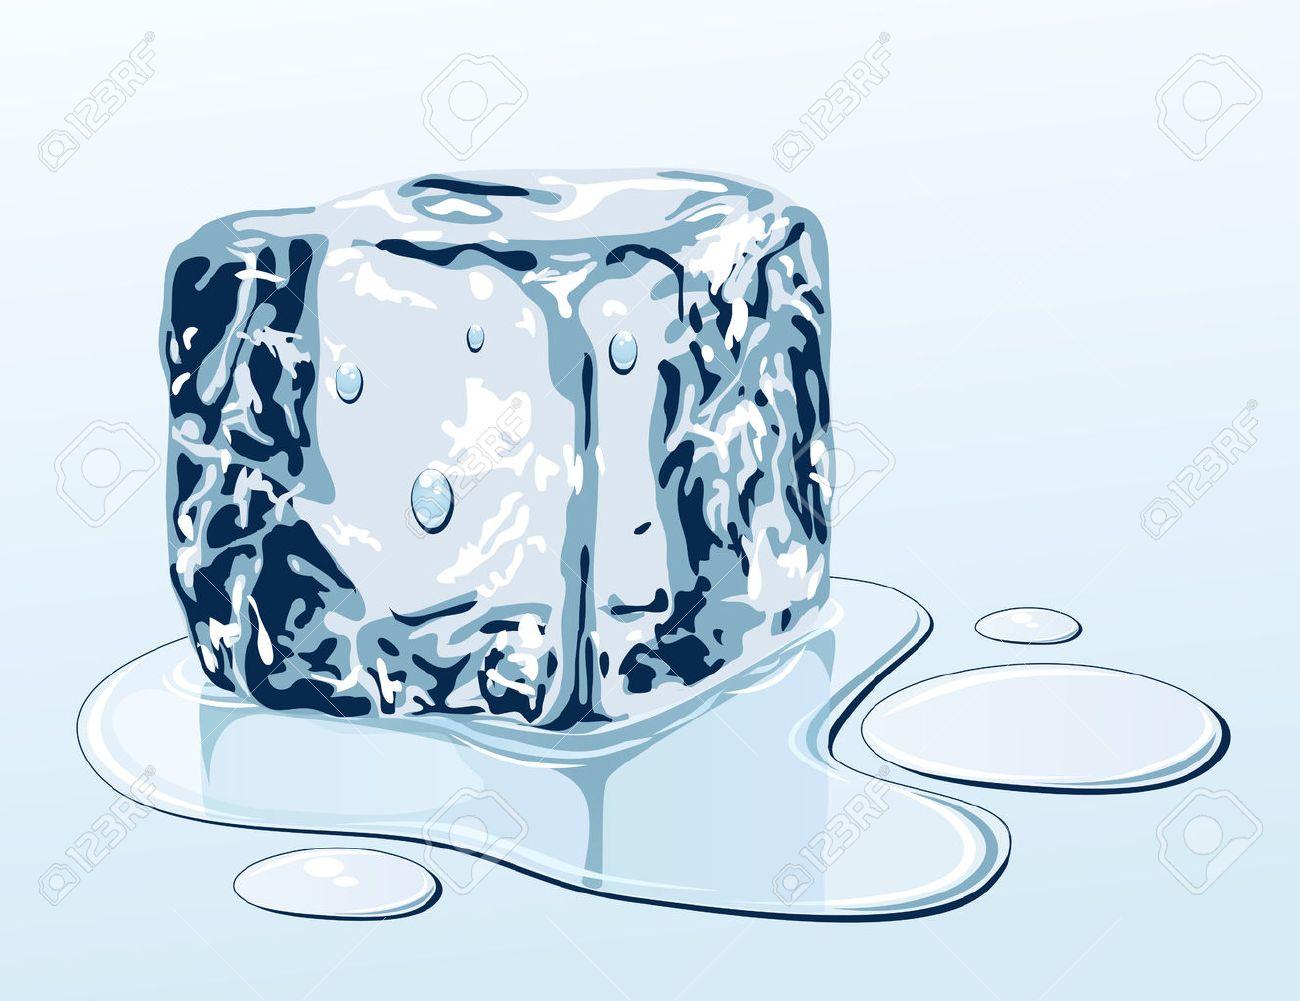 Ice cube on water surface, illustration Stock Vector - 8757845